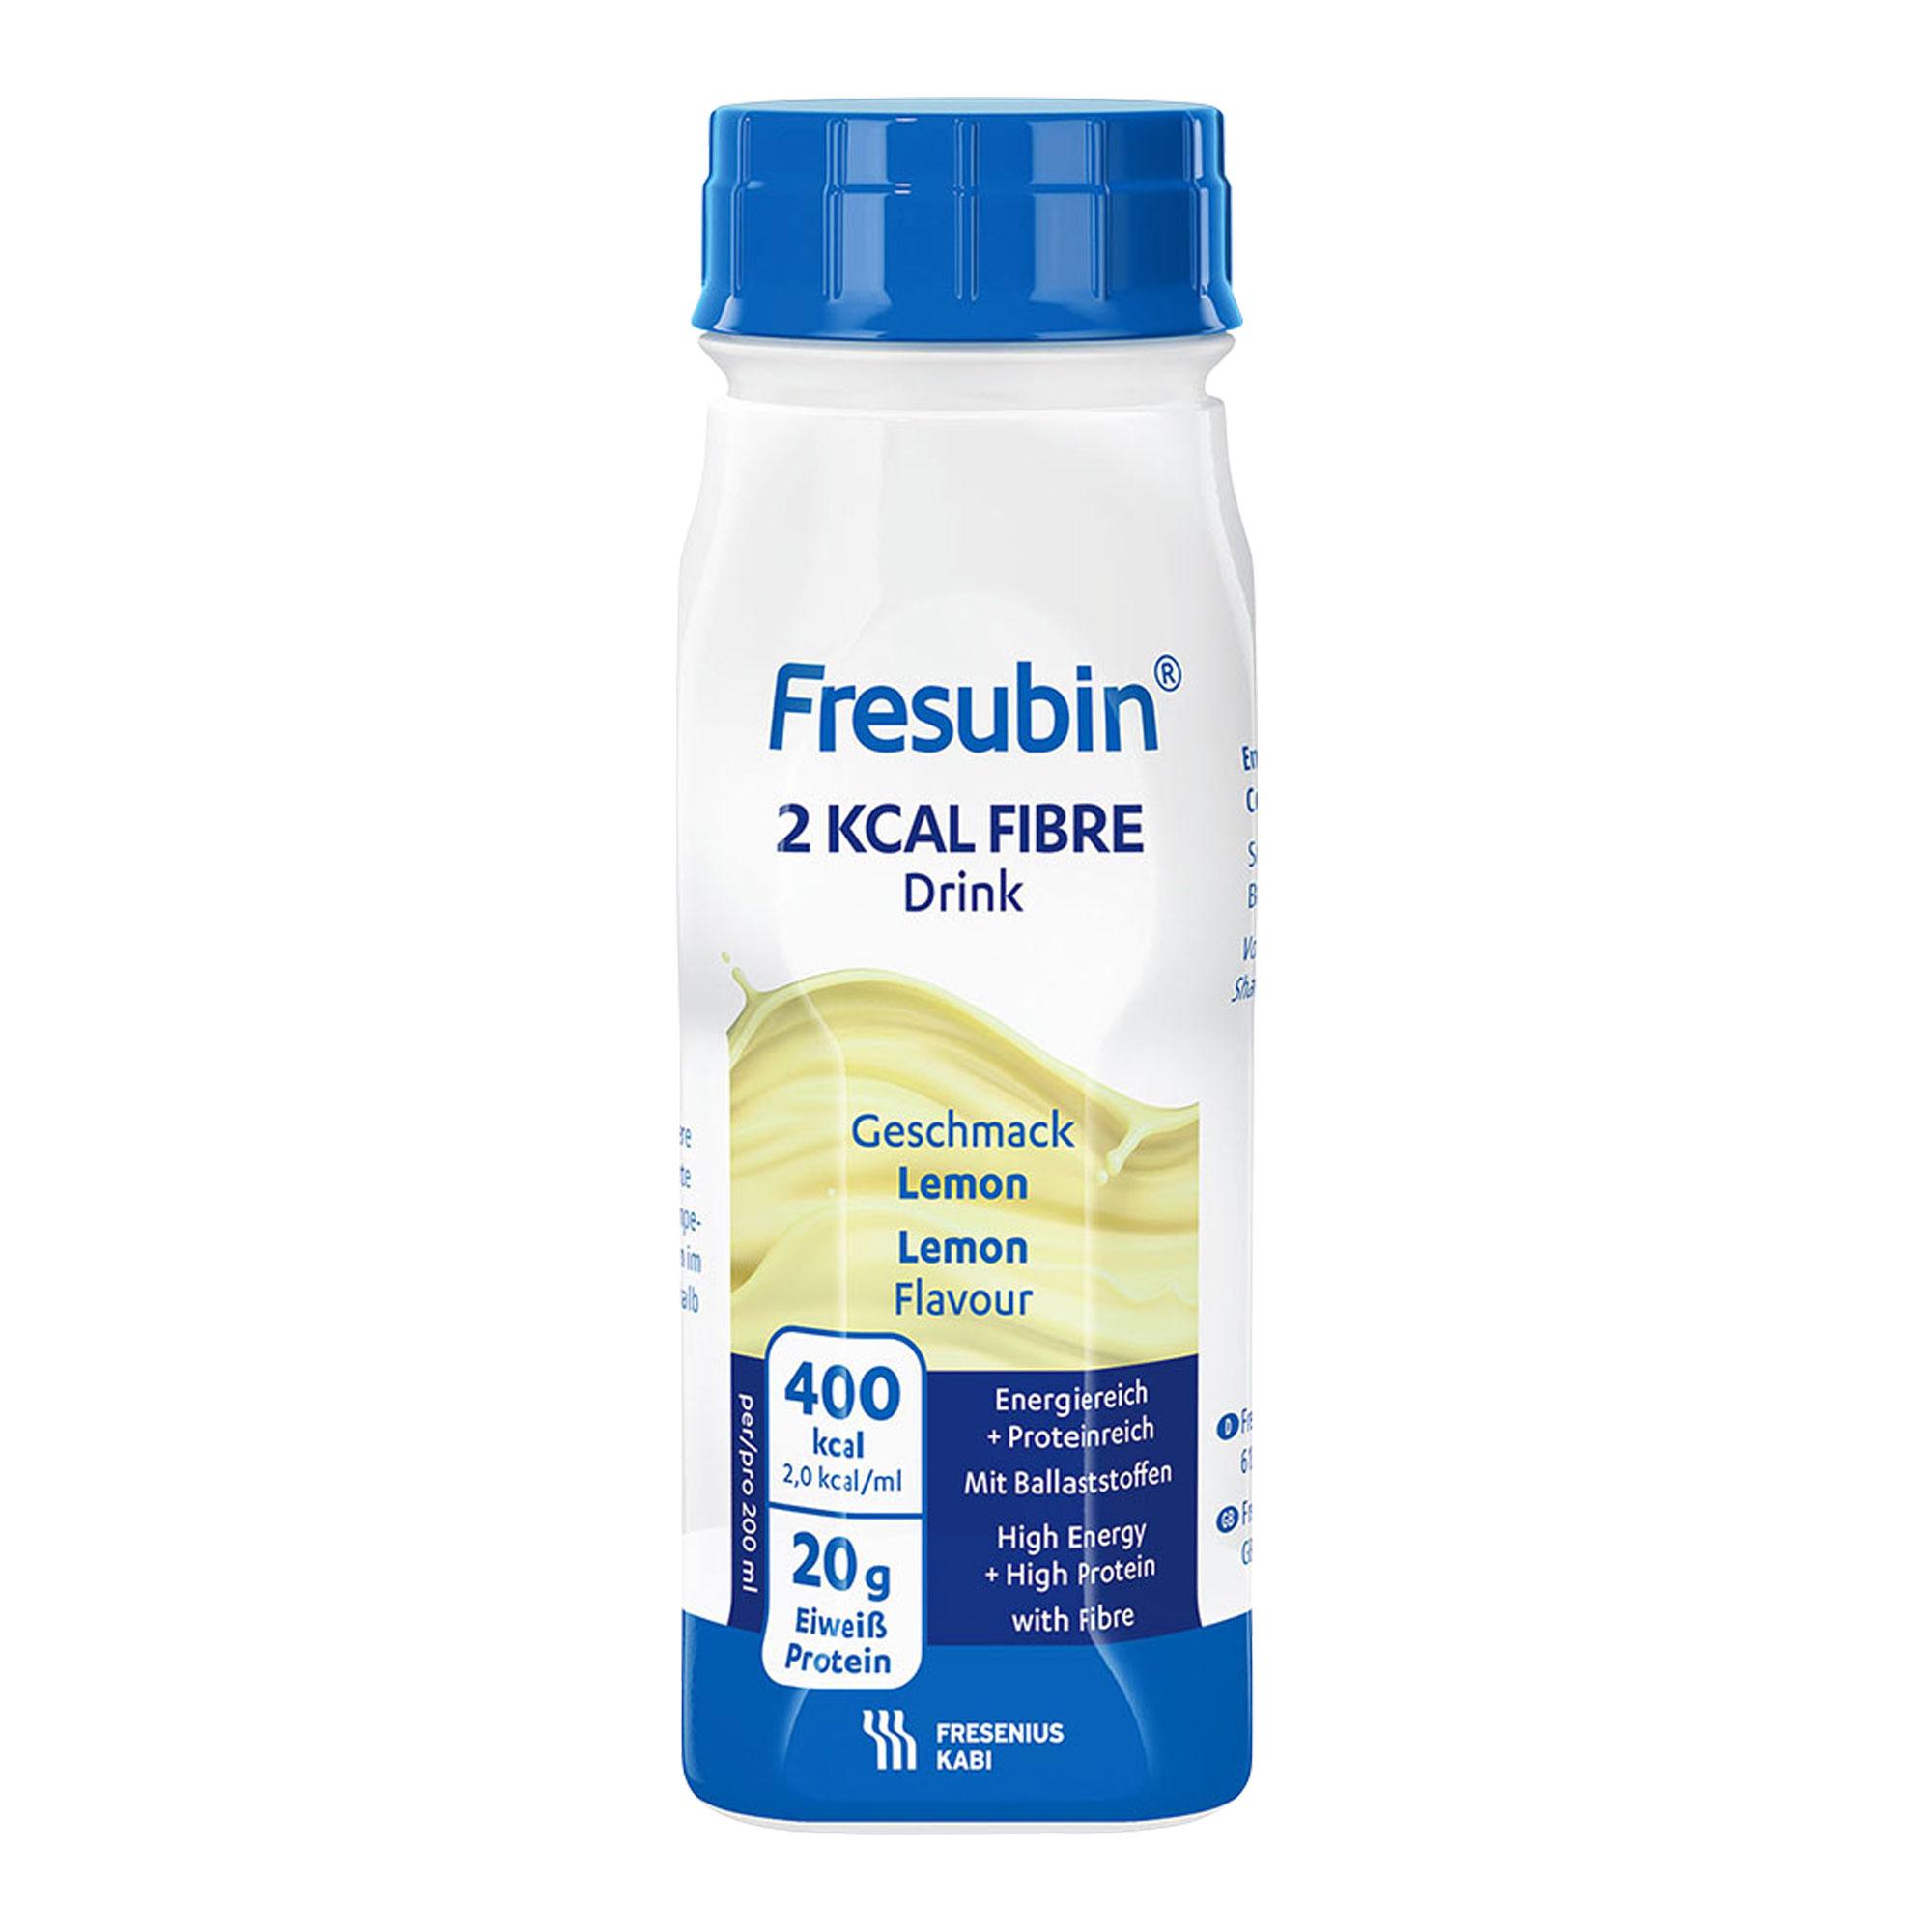 Fresubin 2 kcal fibre DRINK Lemon